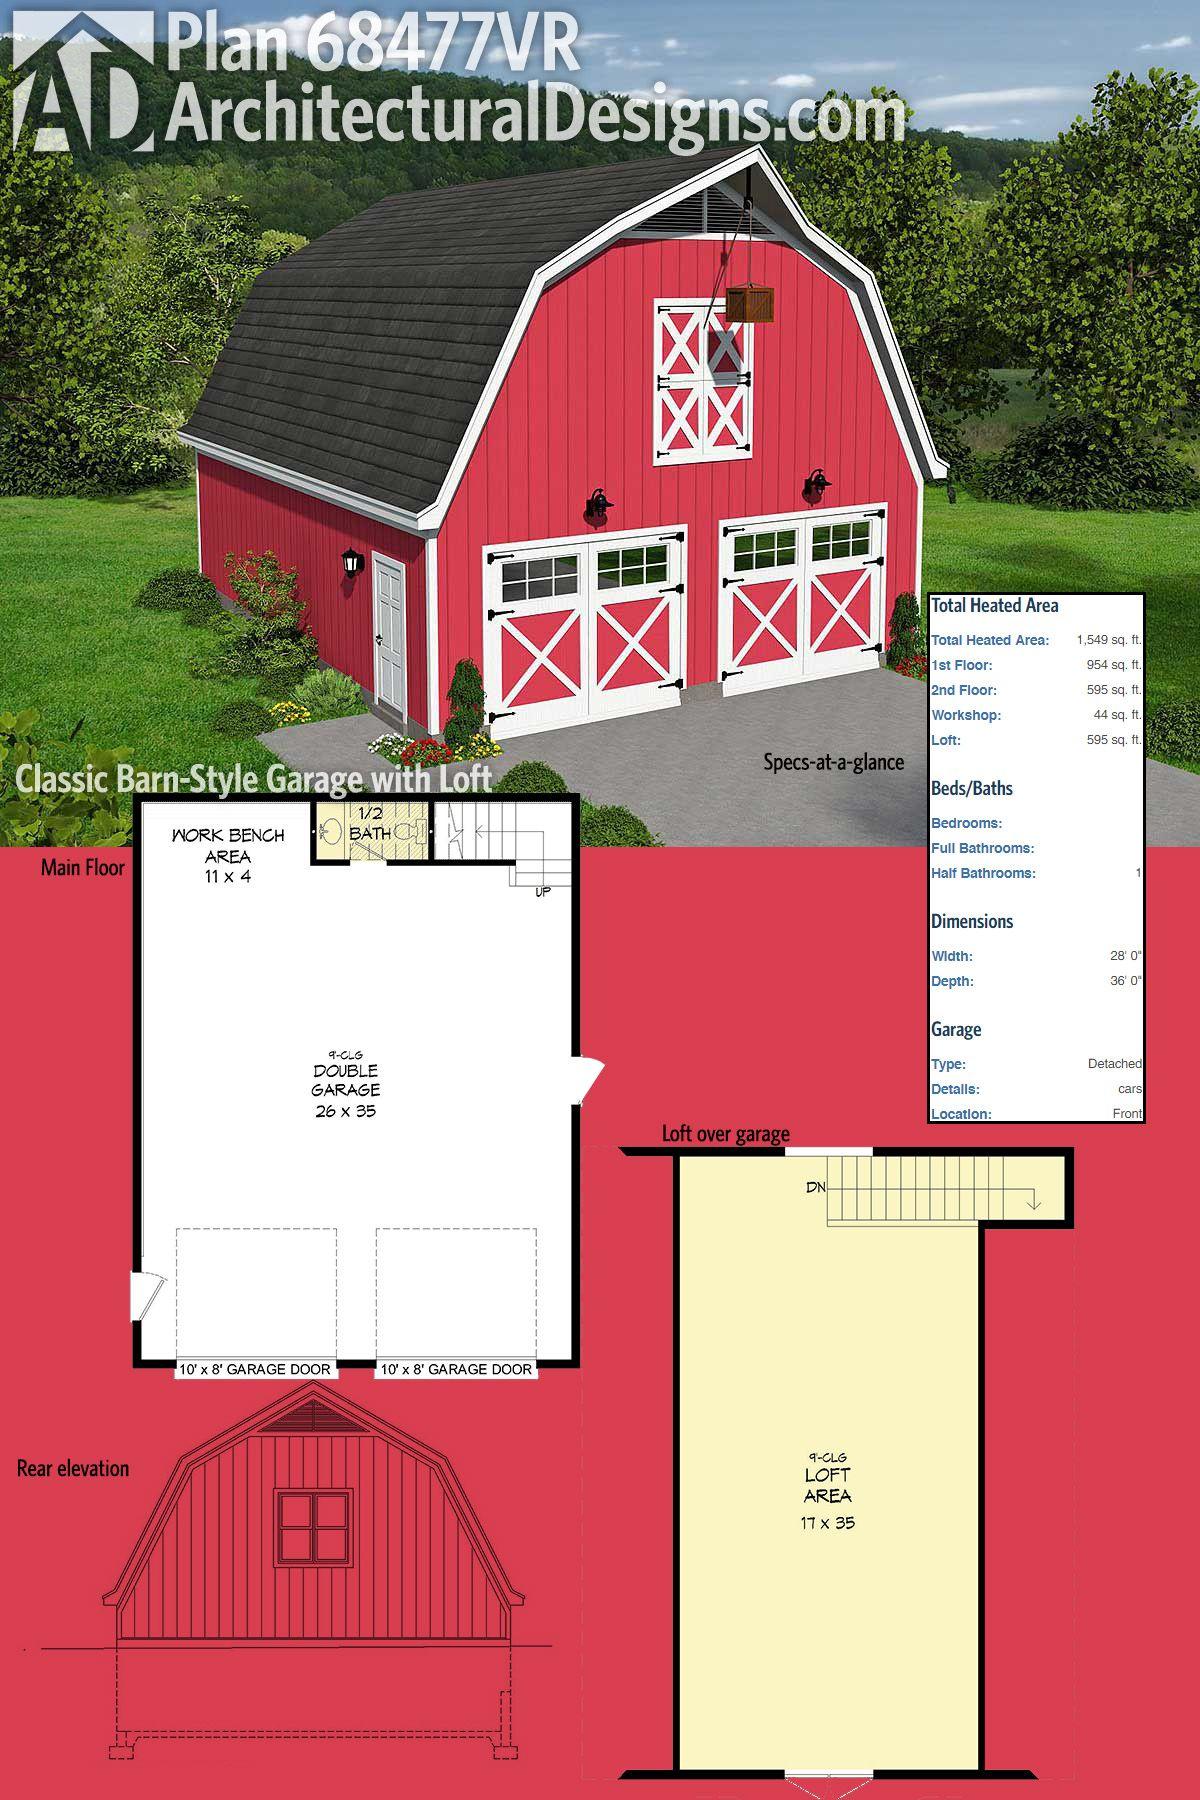 Plan 68477vr Classic Barn Style Garage With Loft Garage Loft